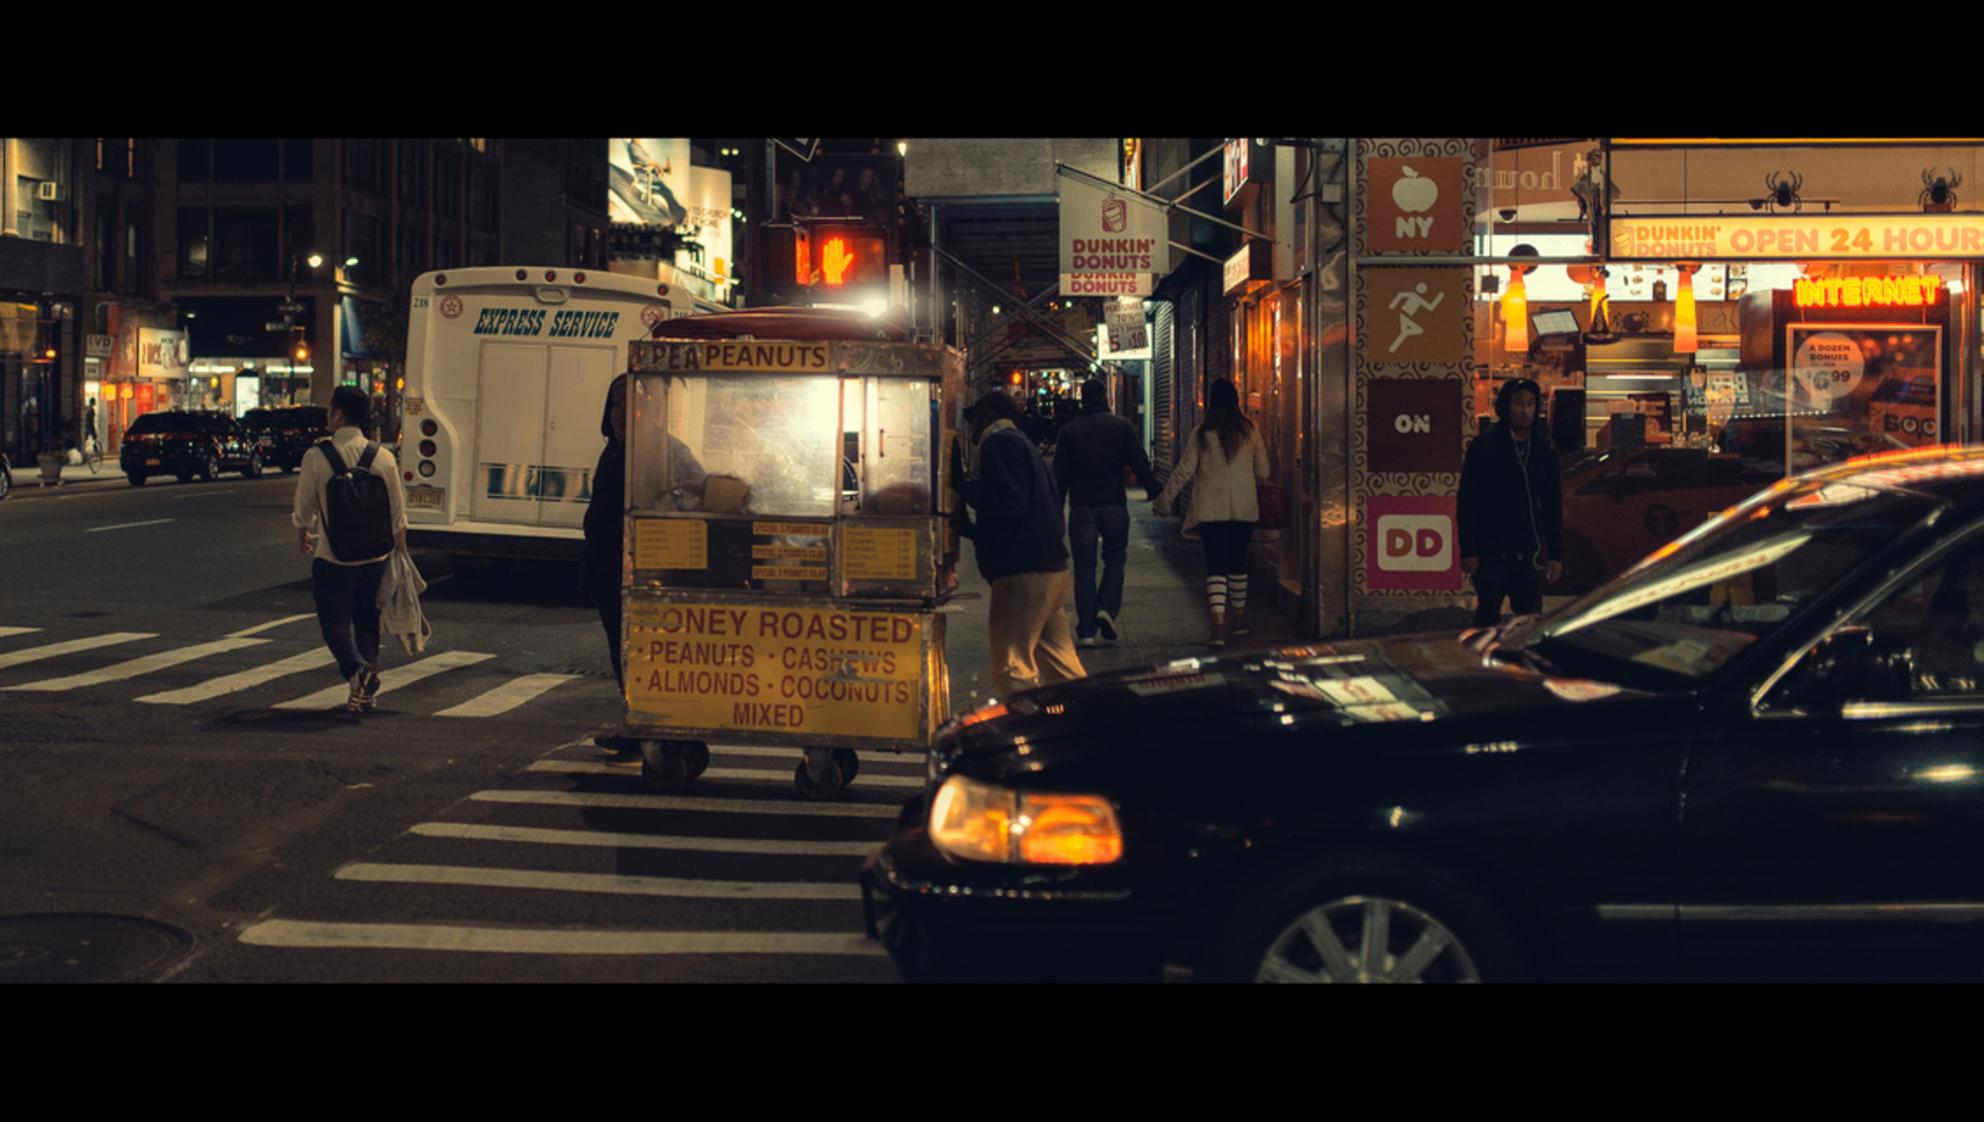 Roasted - [view full screen in a dark setting] - foto door CHRIZ op 14-09-2018 - deze foto bevat: mensen, straat, licht, avond, nyc, nacht, film, manhattan, straatfotografie, 35mm, New York, cinematic, cinematic street